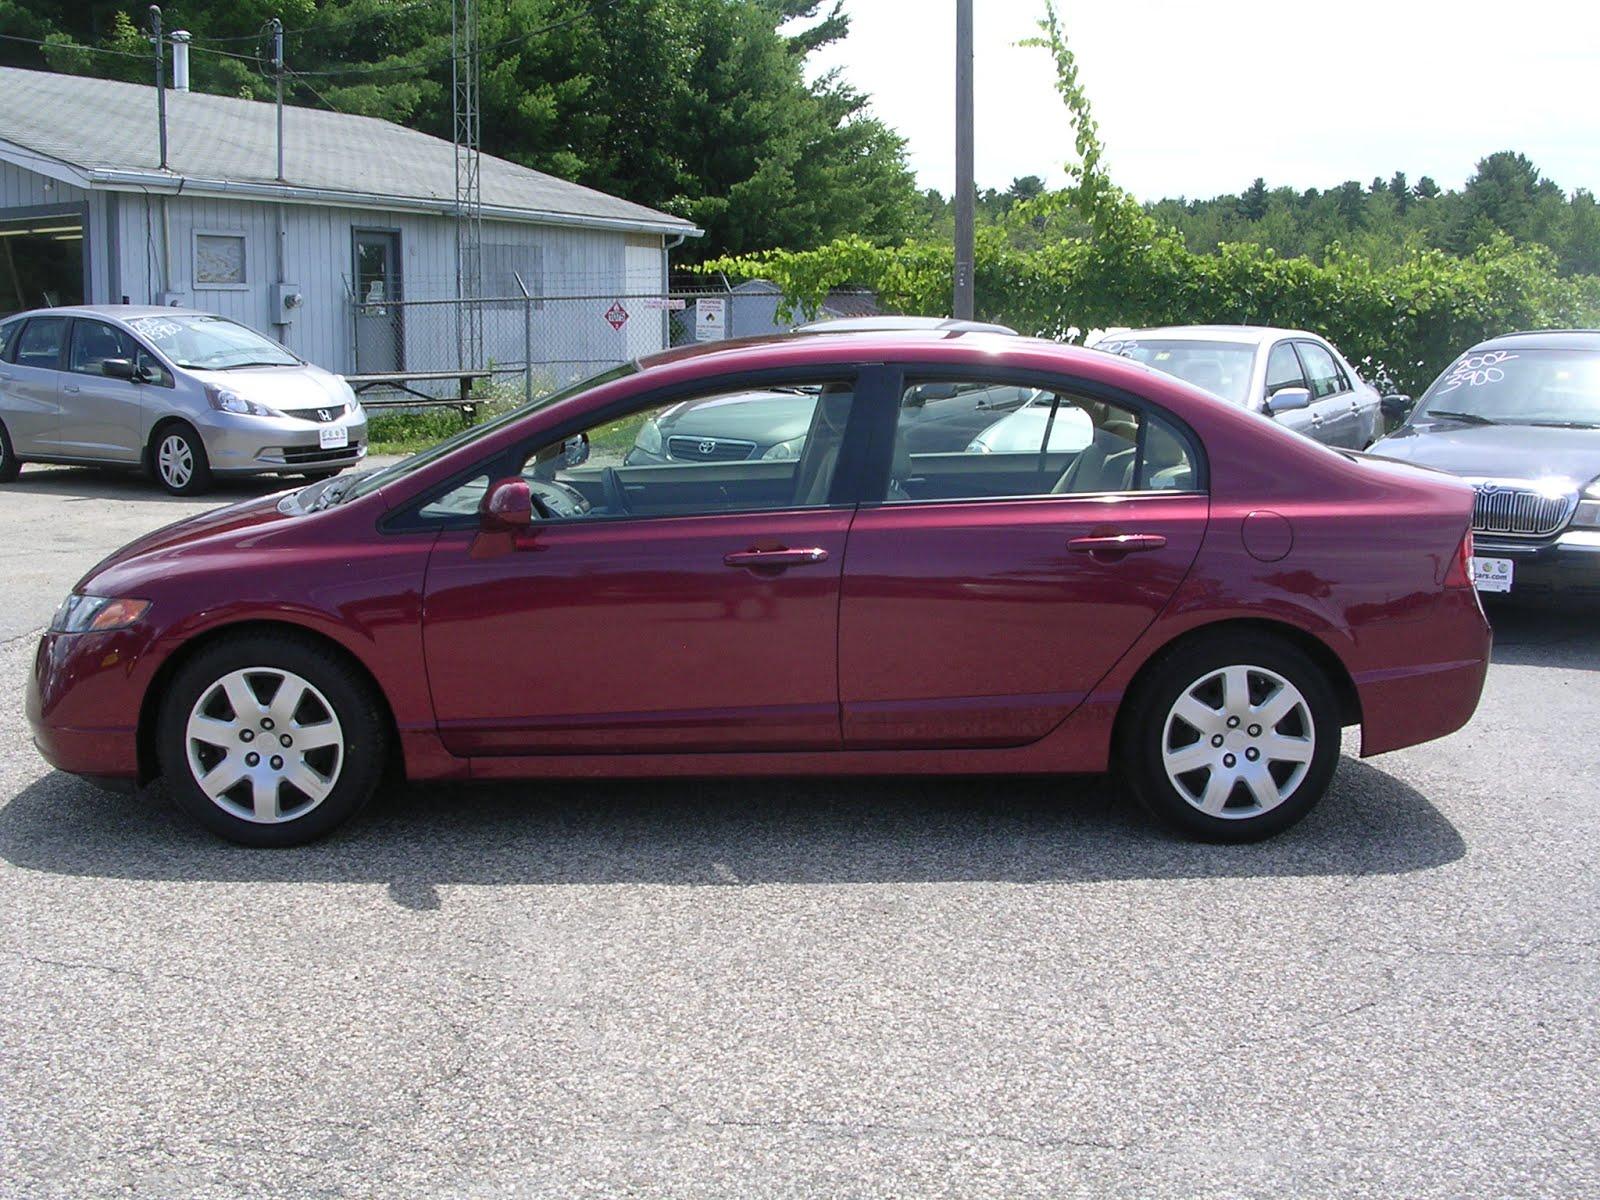 2008 Honda Civic LX, Red, Sedan, 50561 Mi, 11,995 $11,495  Http://bit.ly/NfUZcY Compact, 5 Spd Automatic, MPG U003d 25/36